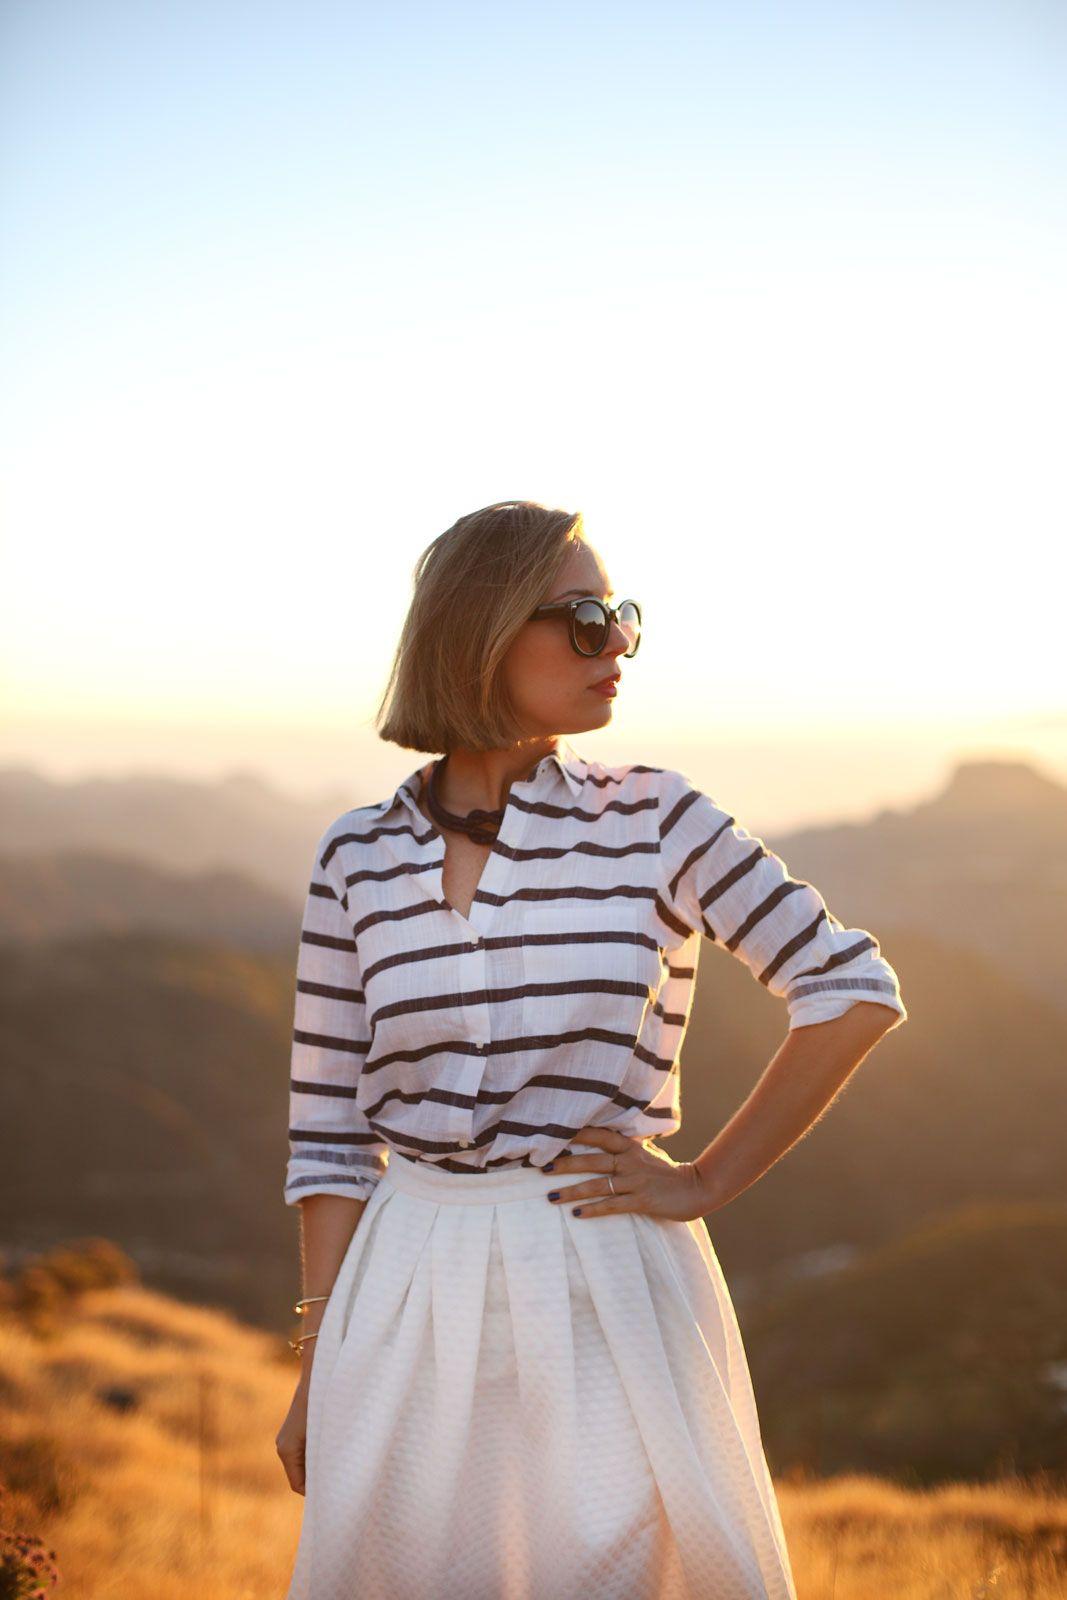 My Showroom: Womens Designer Round Oversize Retro Fashion Sunglasses 8623